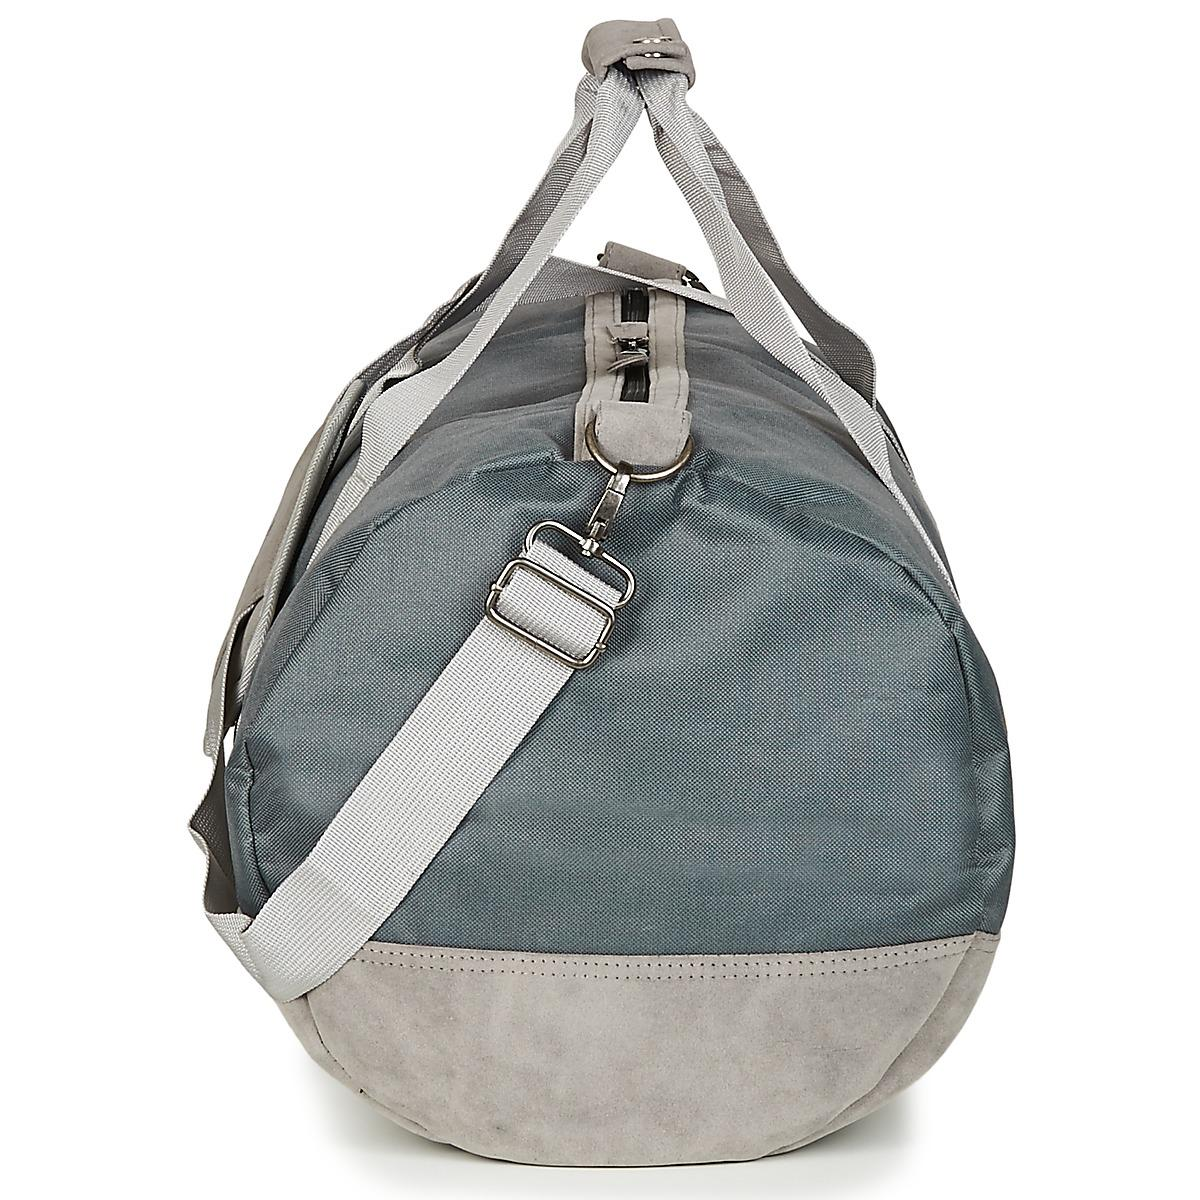 0325e81c0b ... Gray Duffel Classic Men s Sports Bag In Grey for Men - Lyst. View  fullscreen